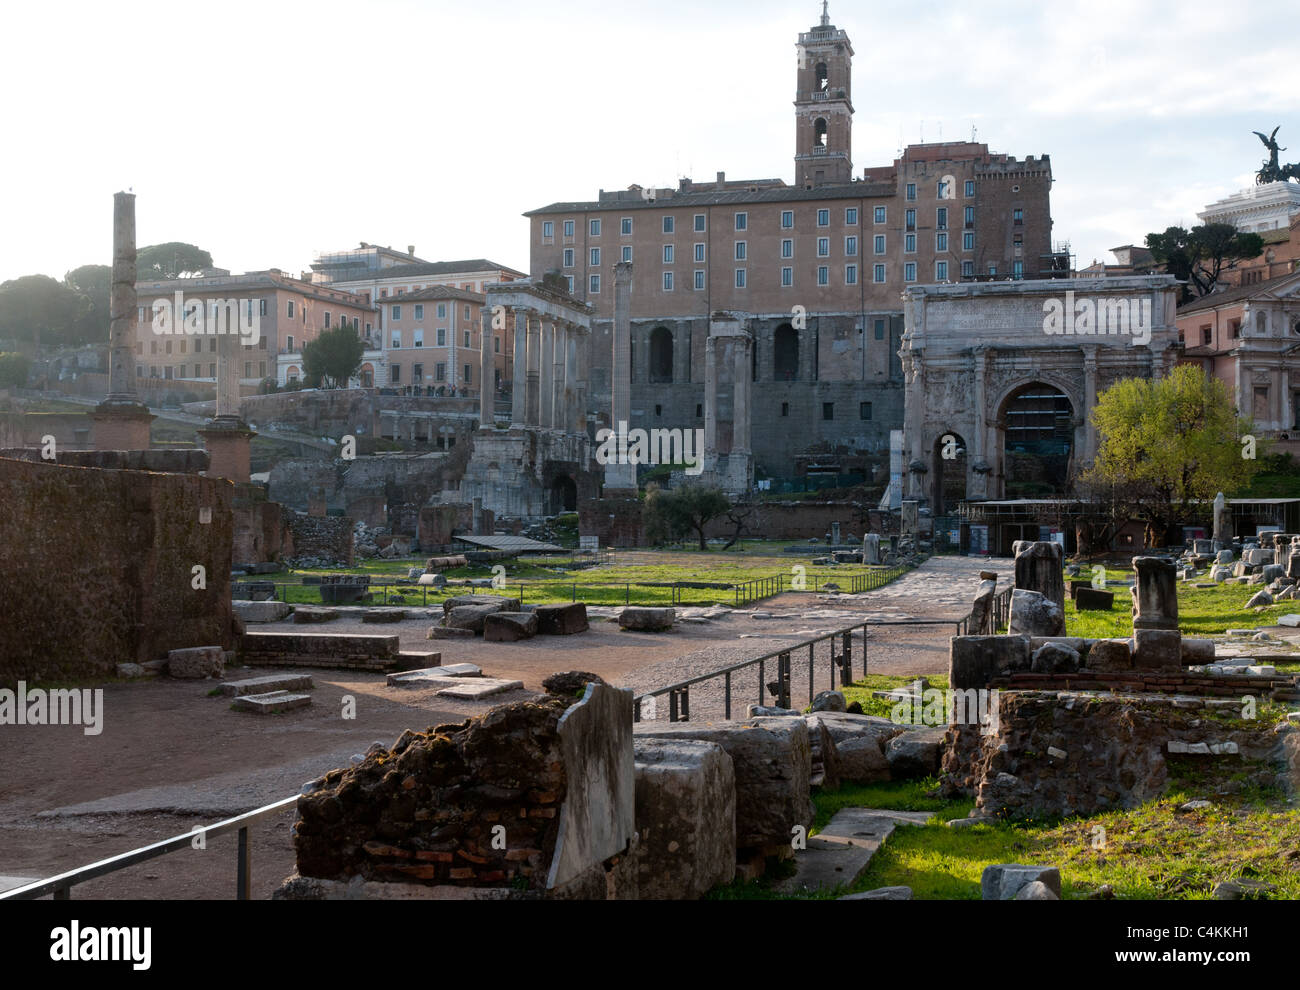 The main Via Sacra of the Roman Forum, Foro Romano, Rome, Italy - Stock Image